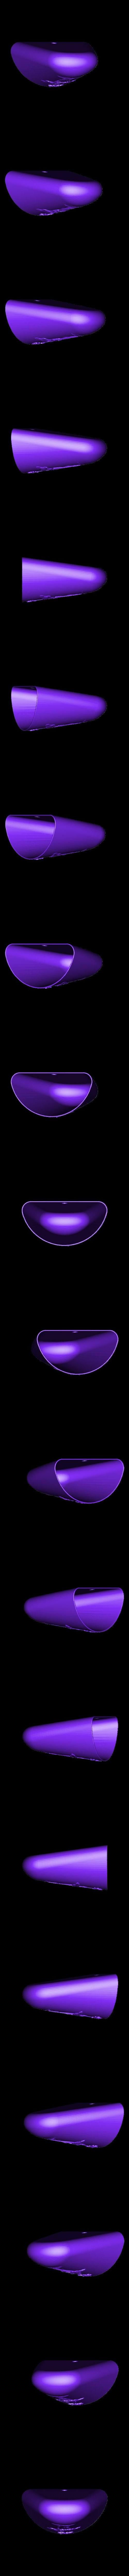 DECORATIVE_FLOWER-POT.stl Download free STL file Decorative flower pot • 3D printable design, omni-moulage